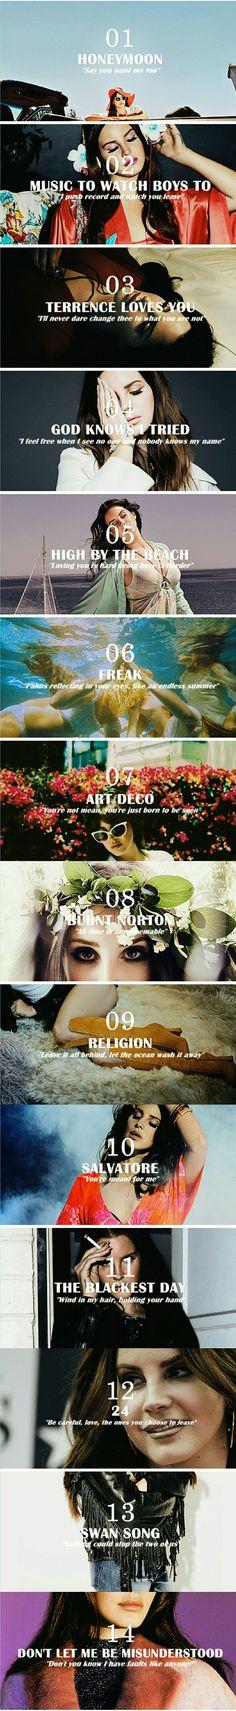 Lana Del Rey #LDR (songs and lyrics from Honeymoon)